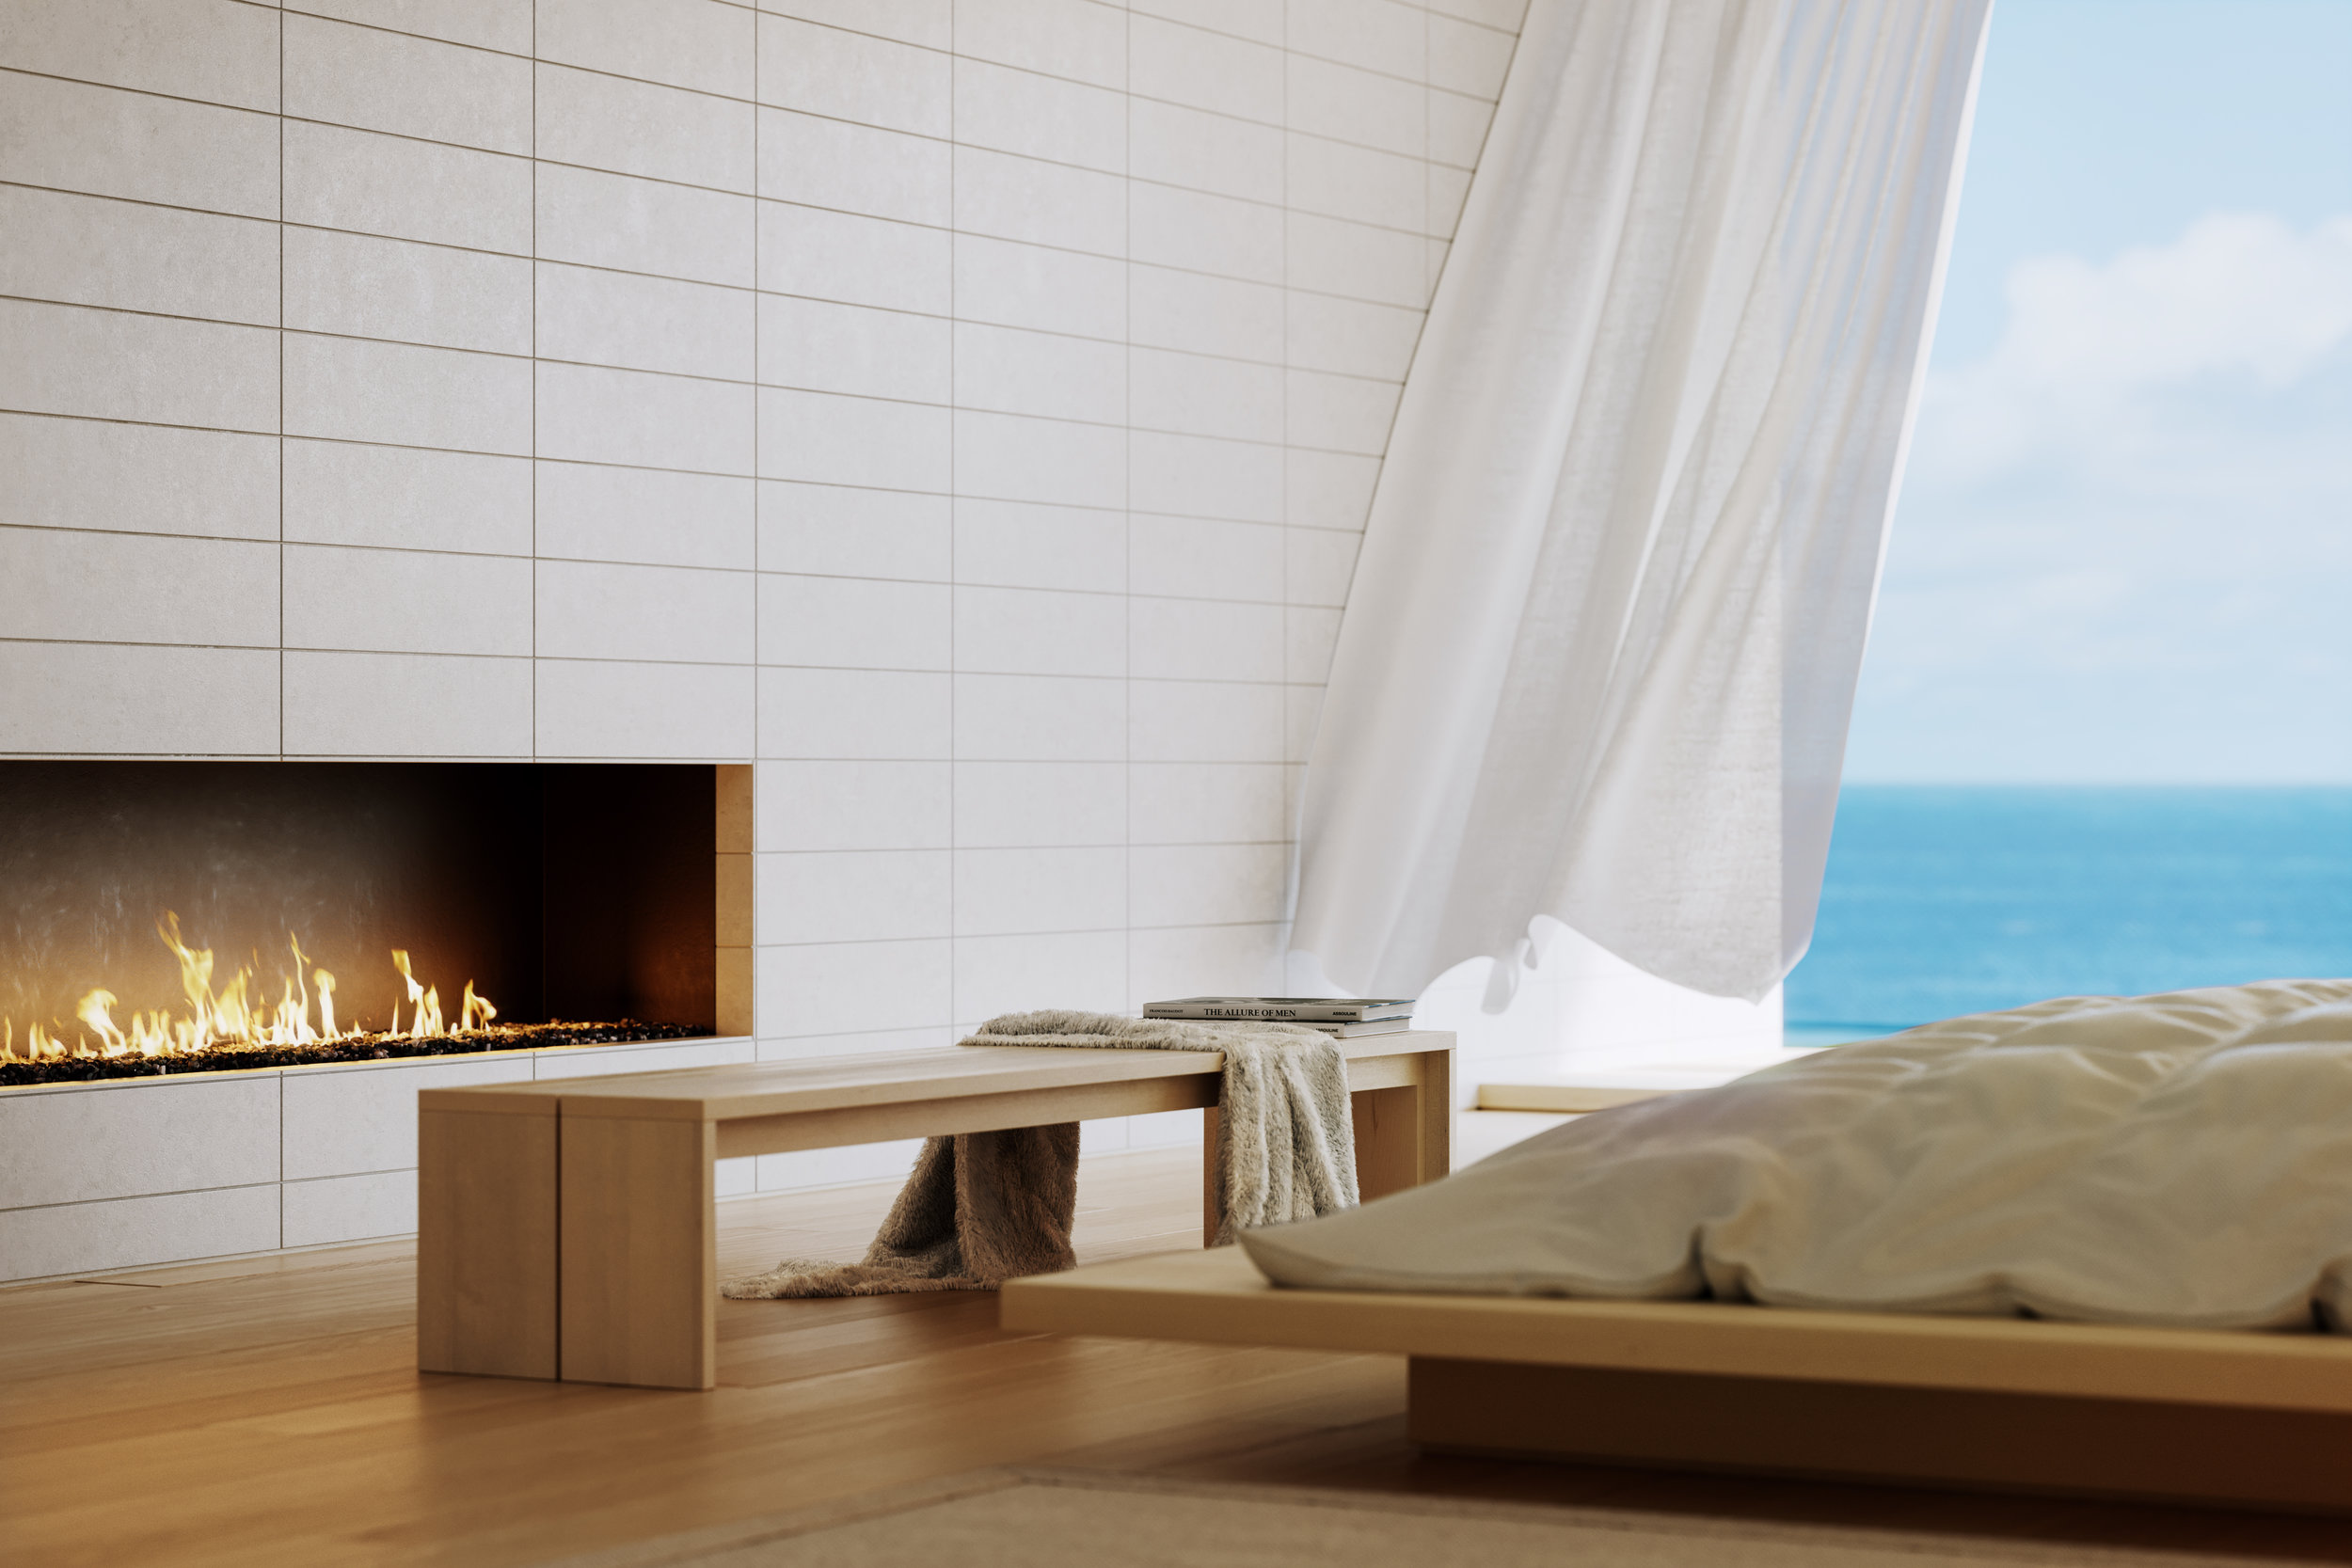 serrano res_bedroom fireplace vignette.jpg